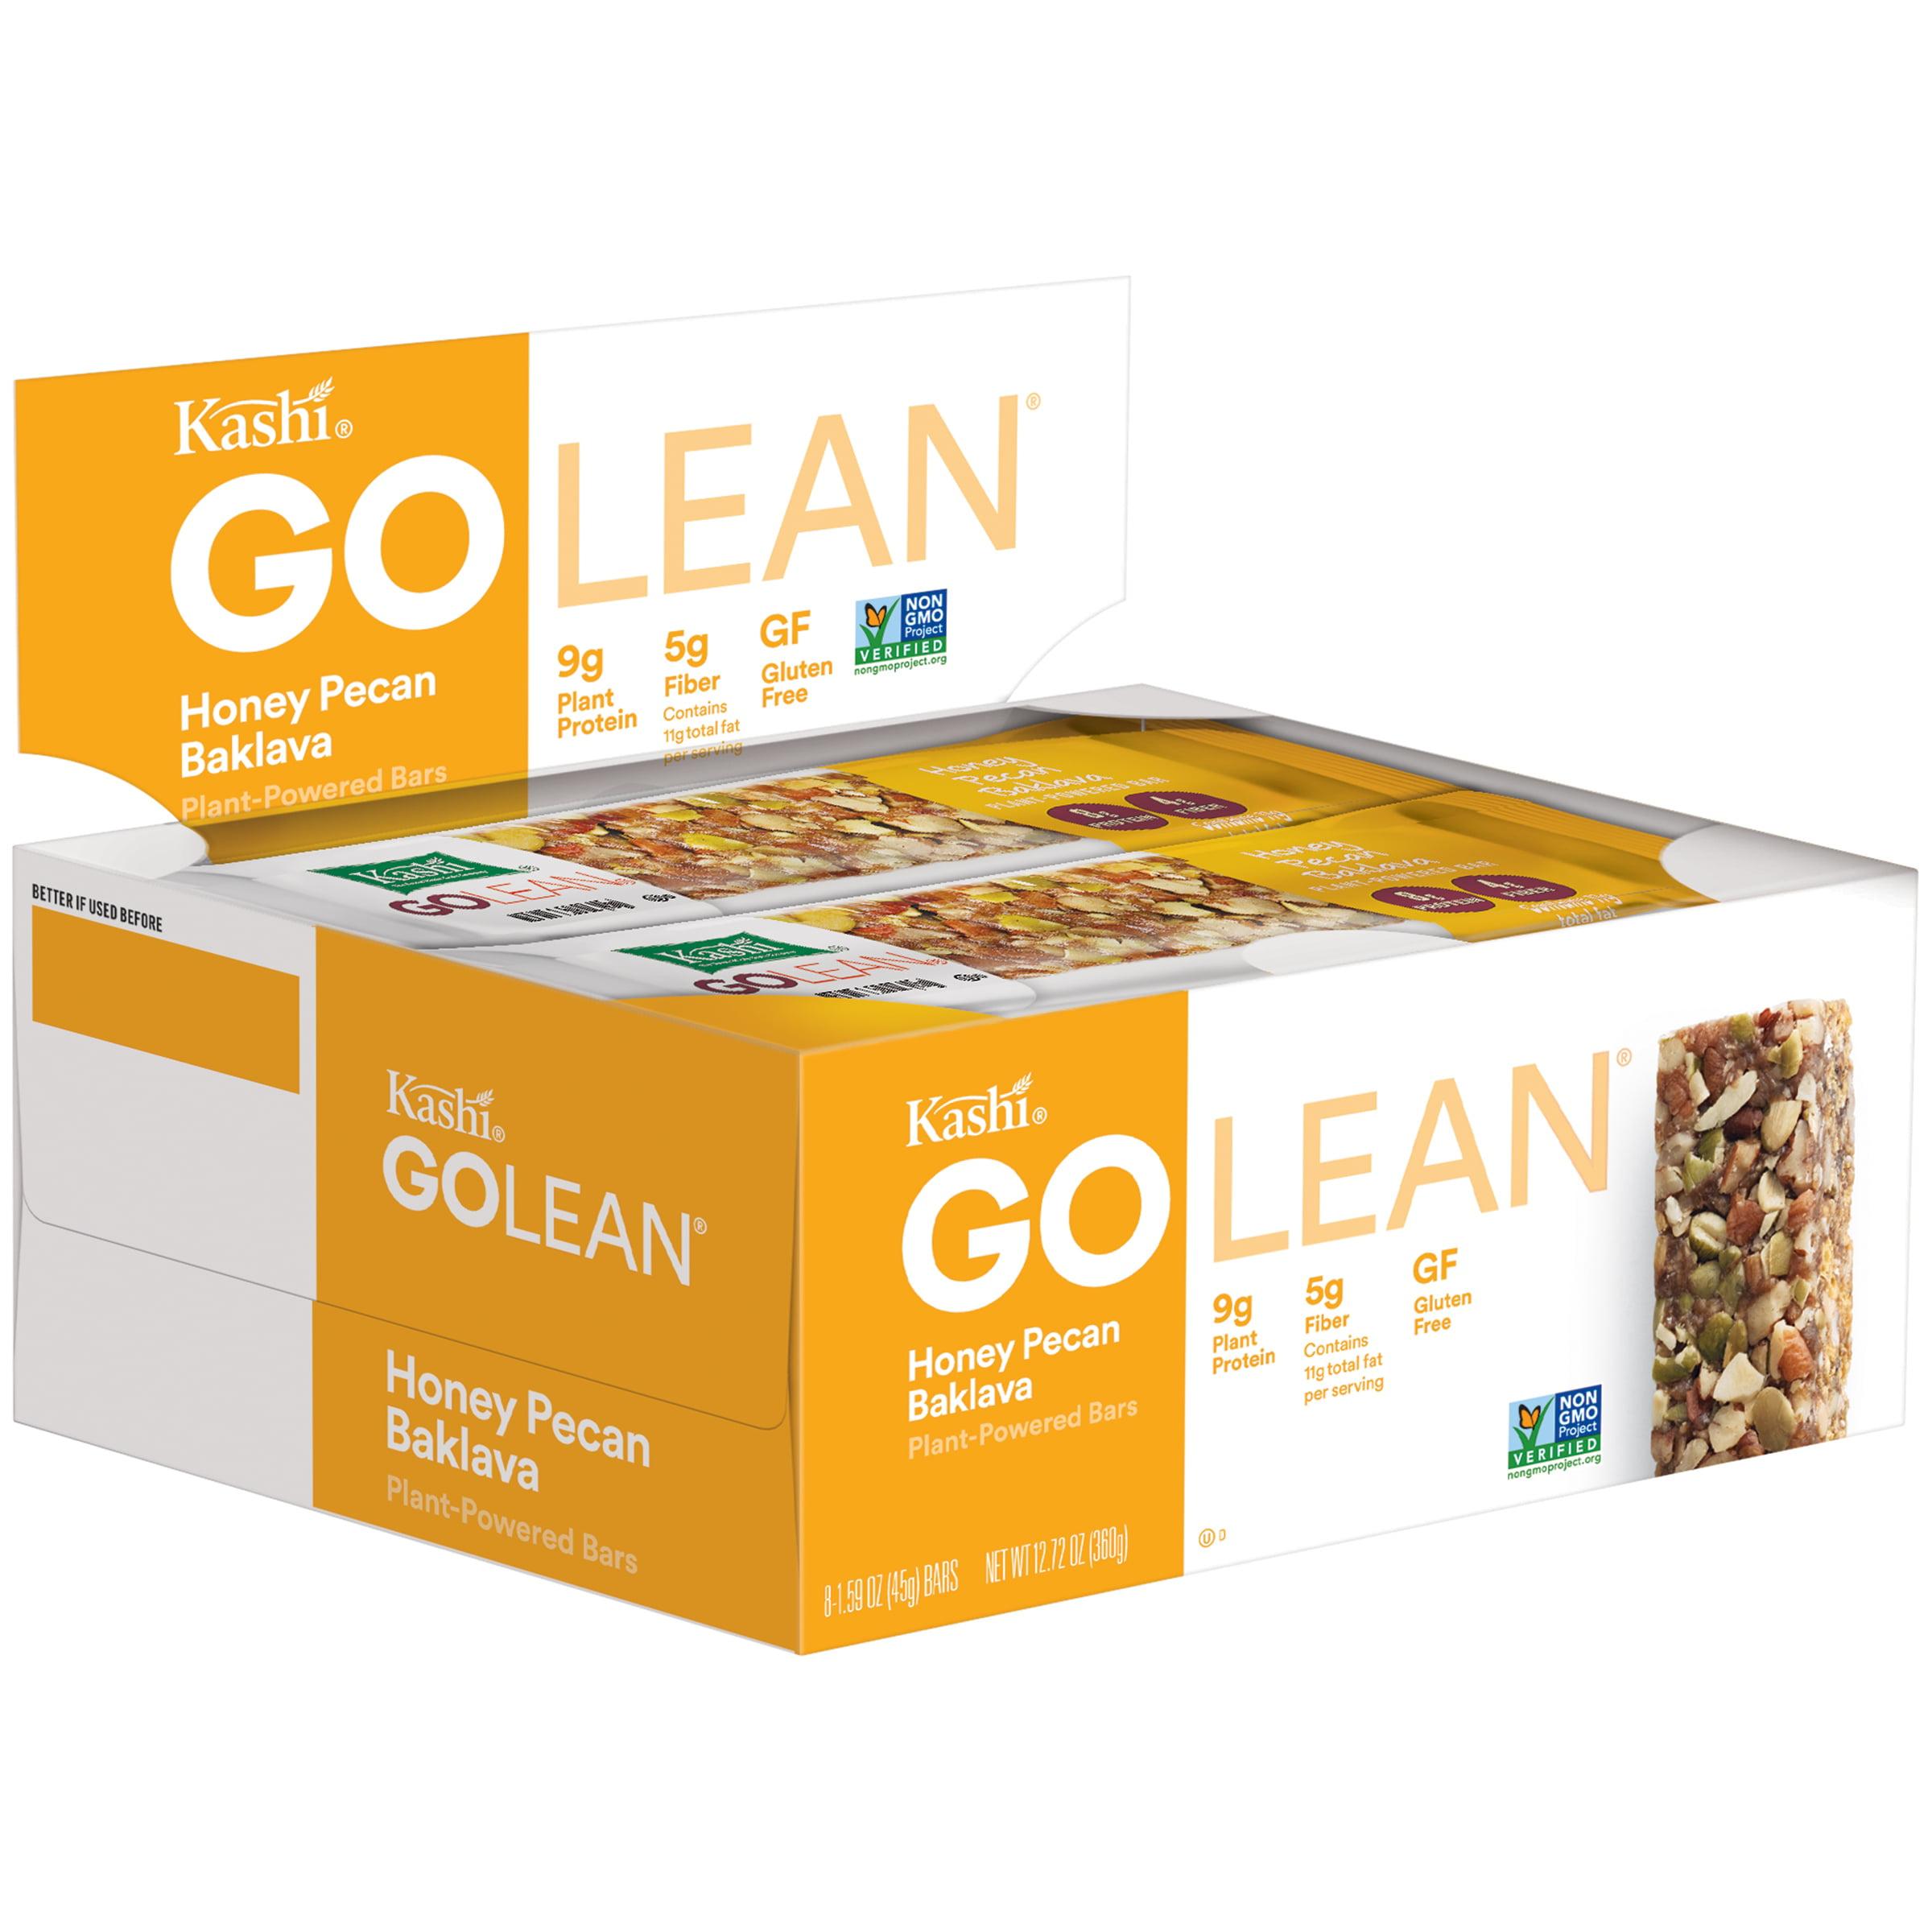 Kashi Go Lean Honey Pecan Baklava Plant-Powered Bars 8-1.59 oz. Box by Kashi Sales LLC.